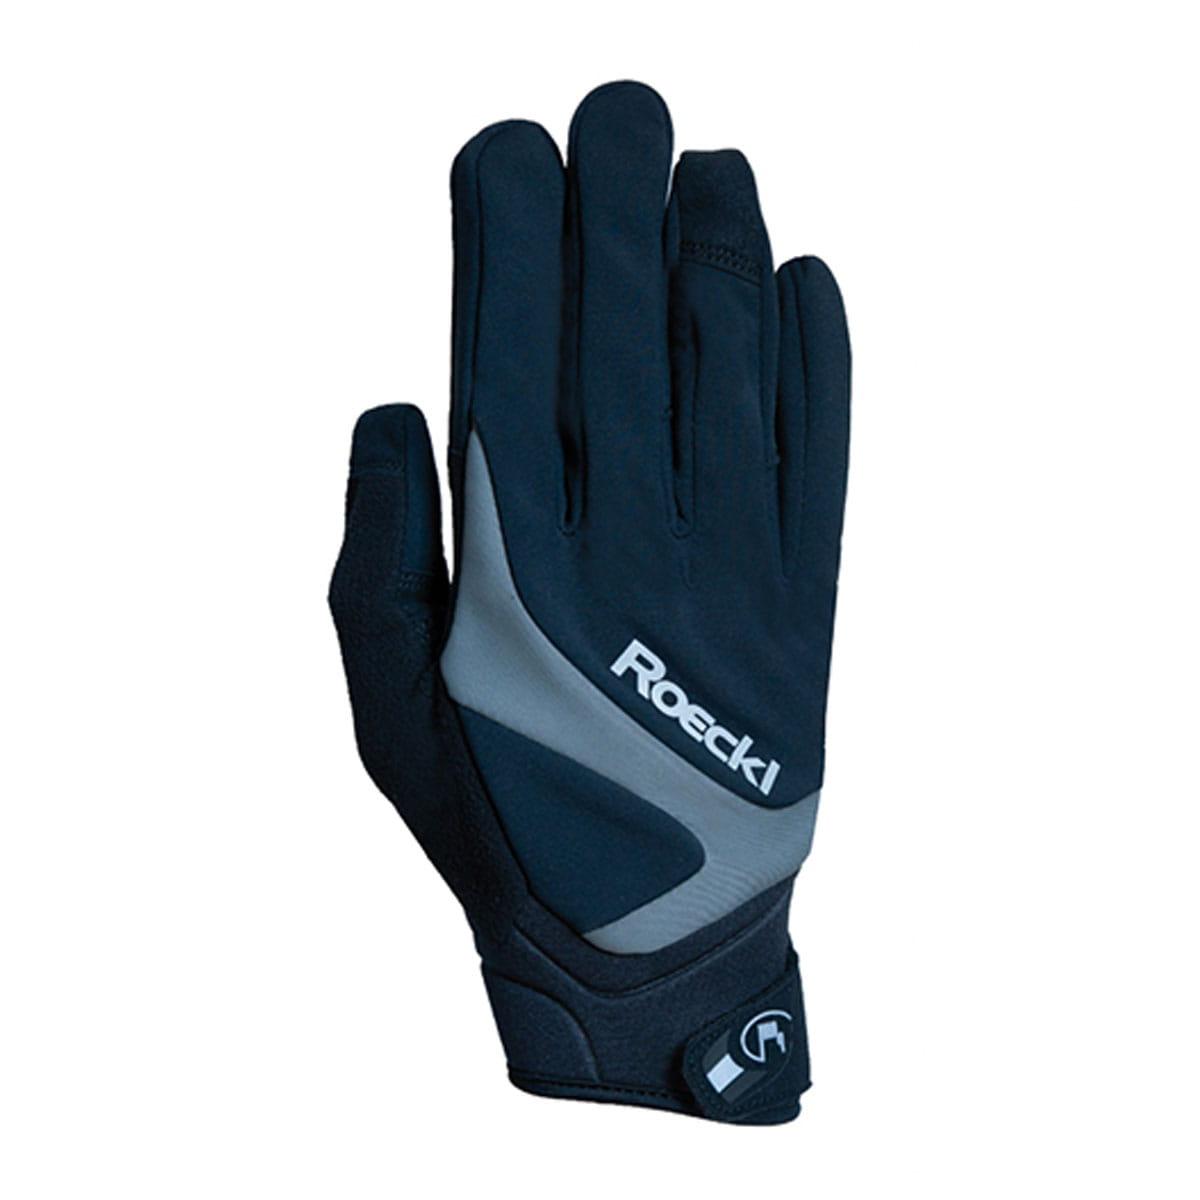 Roeckl Rhein Winter Fahrrad Handschuhe schwarz//grau 2020